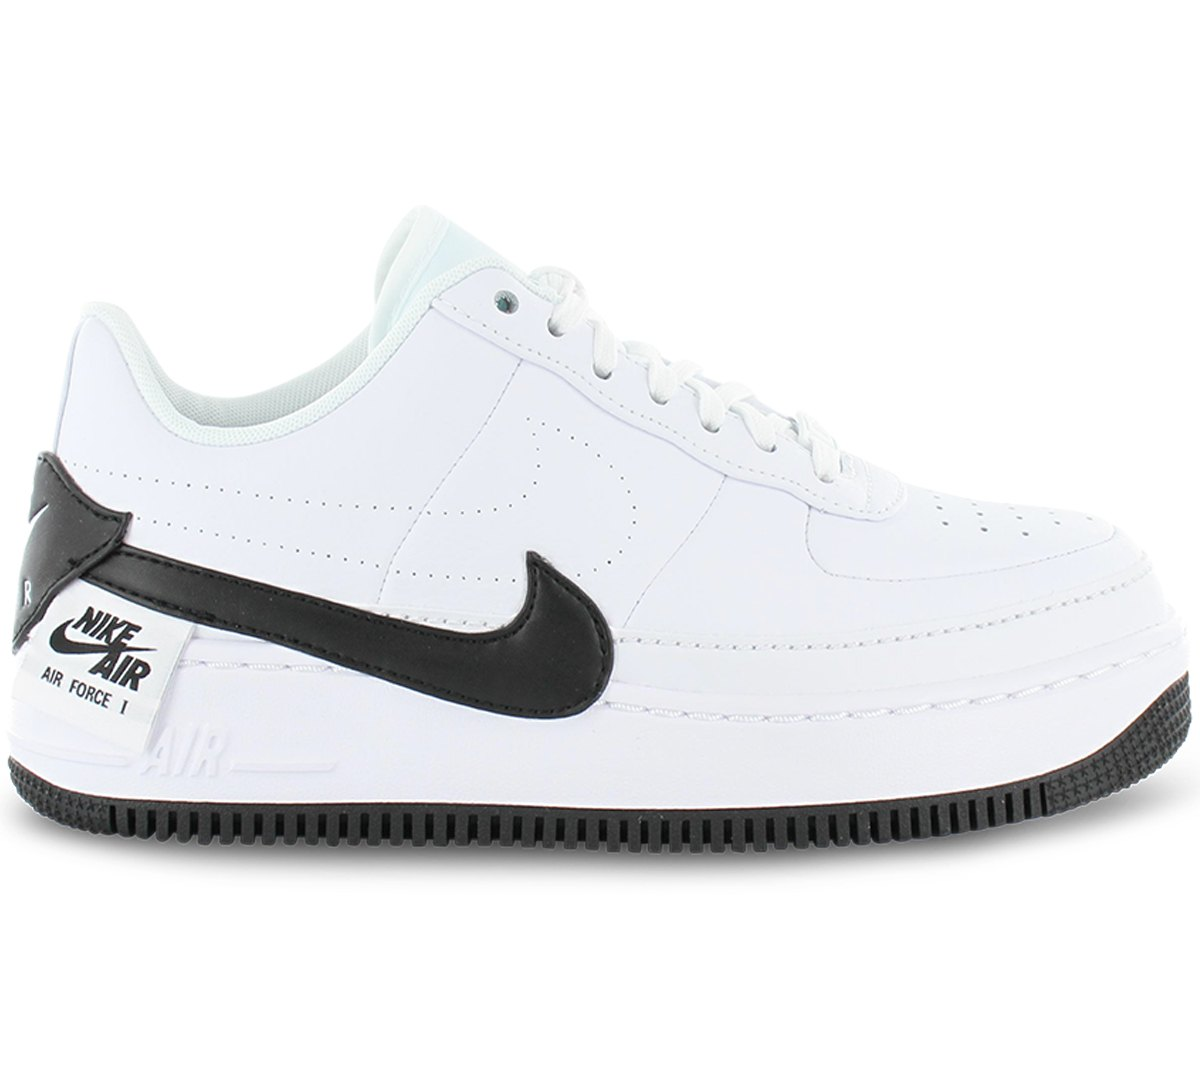 Nike Damen Air Force 1 '07 LX Sneakers aus strukturiertem